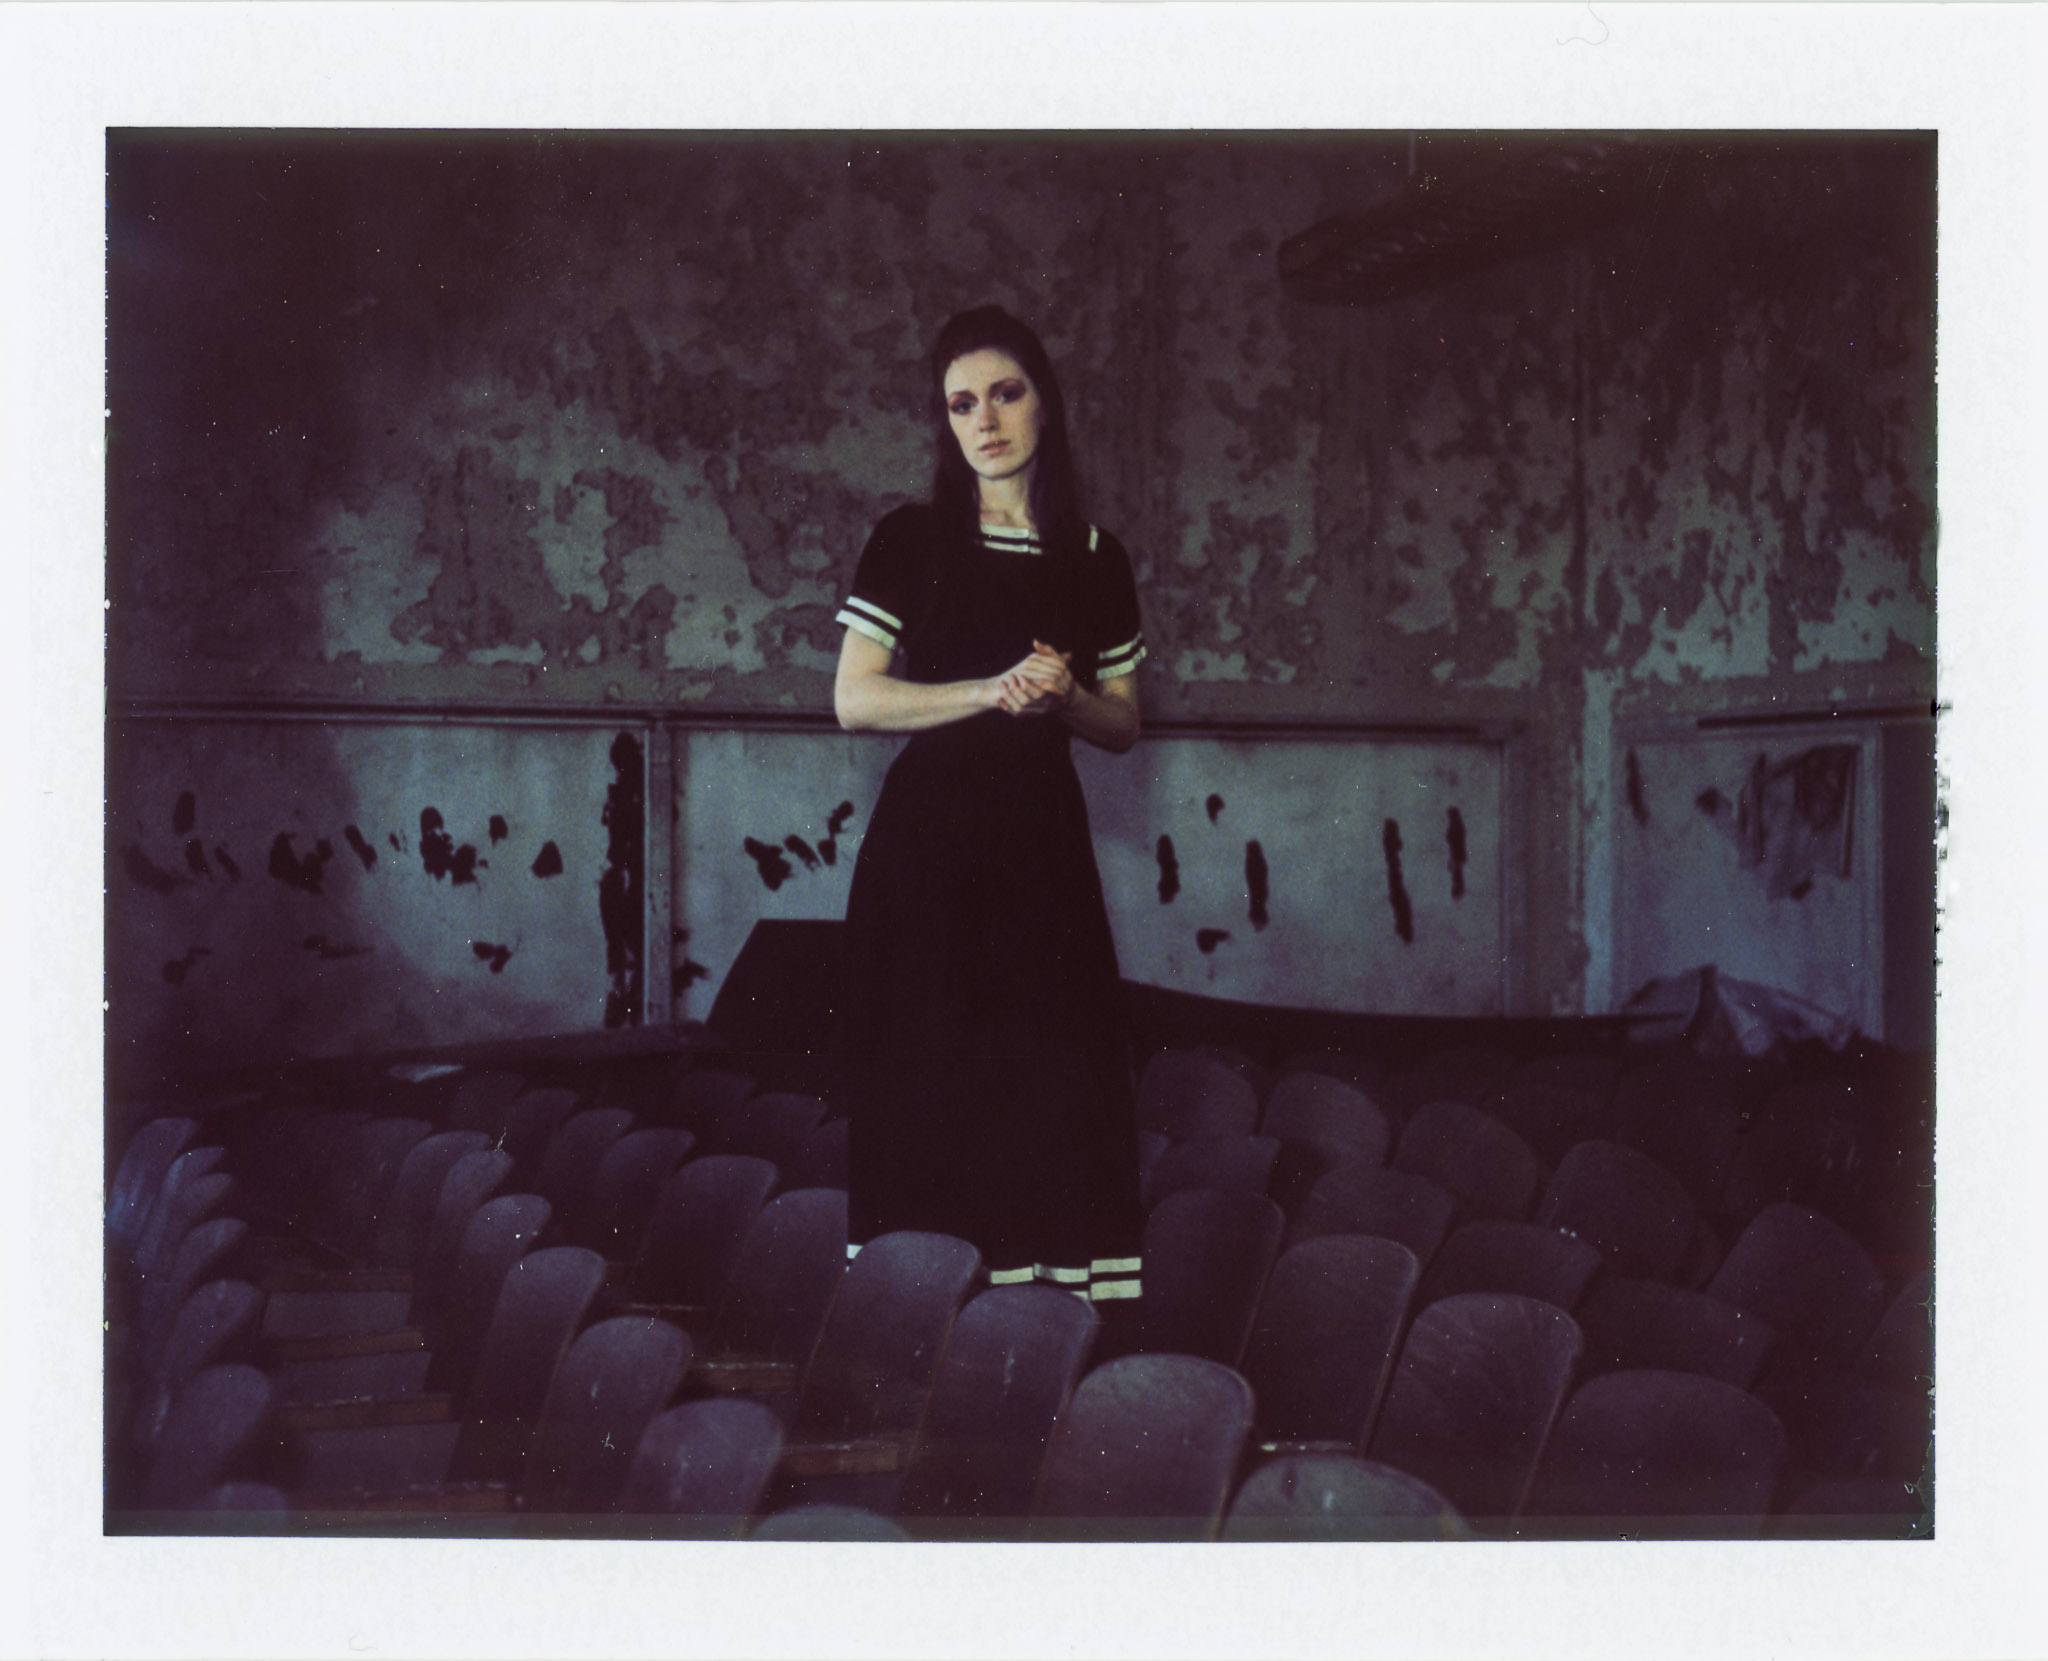 Model: Meagan Hamilton      Camera: Polaroid Land Camera 450 Modified   Lens: Ektar 127mm   Film: FujifilmFP-100c